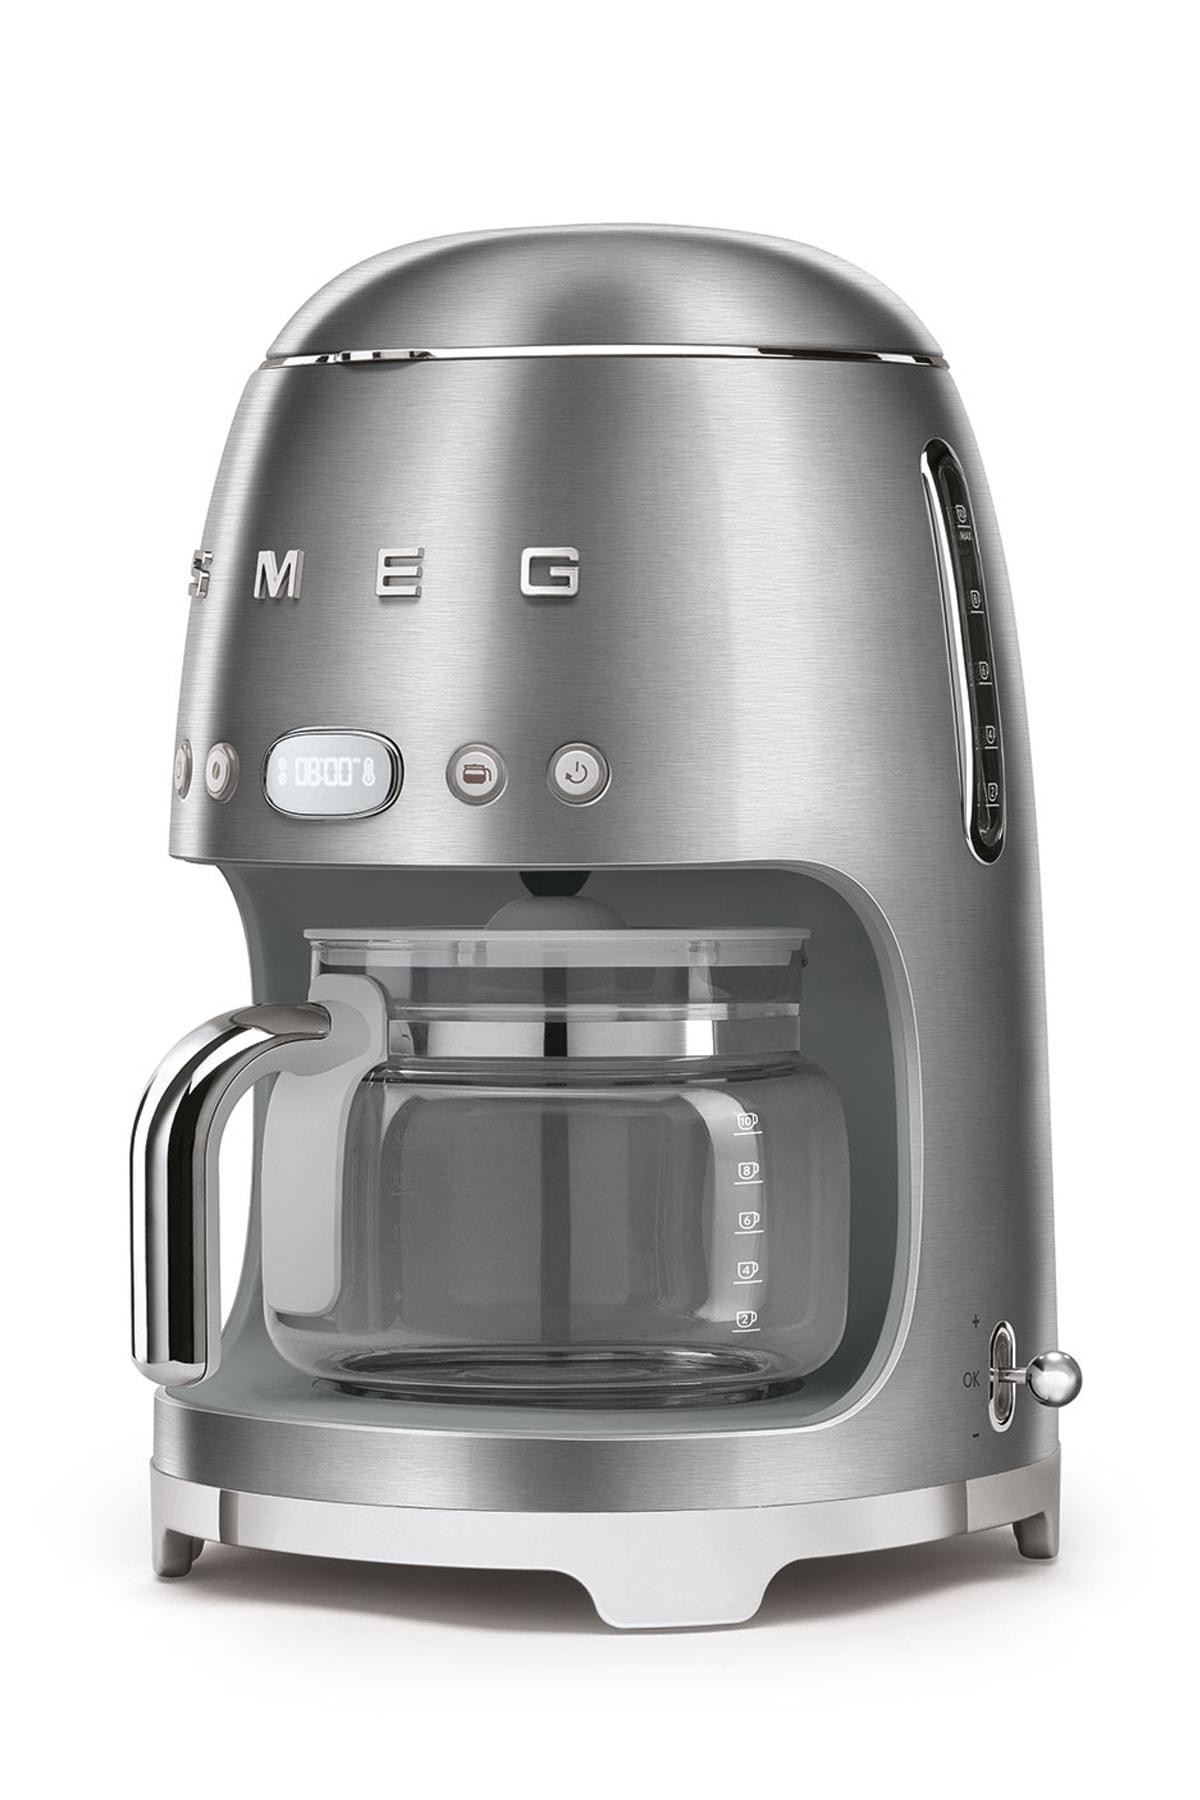 SMEG Çelik Filtre Kahve Makinası 50's Retro Dcf02sseu 2